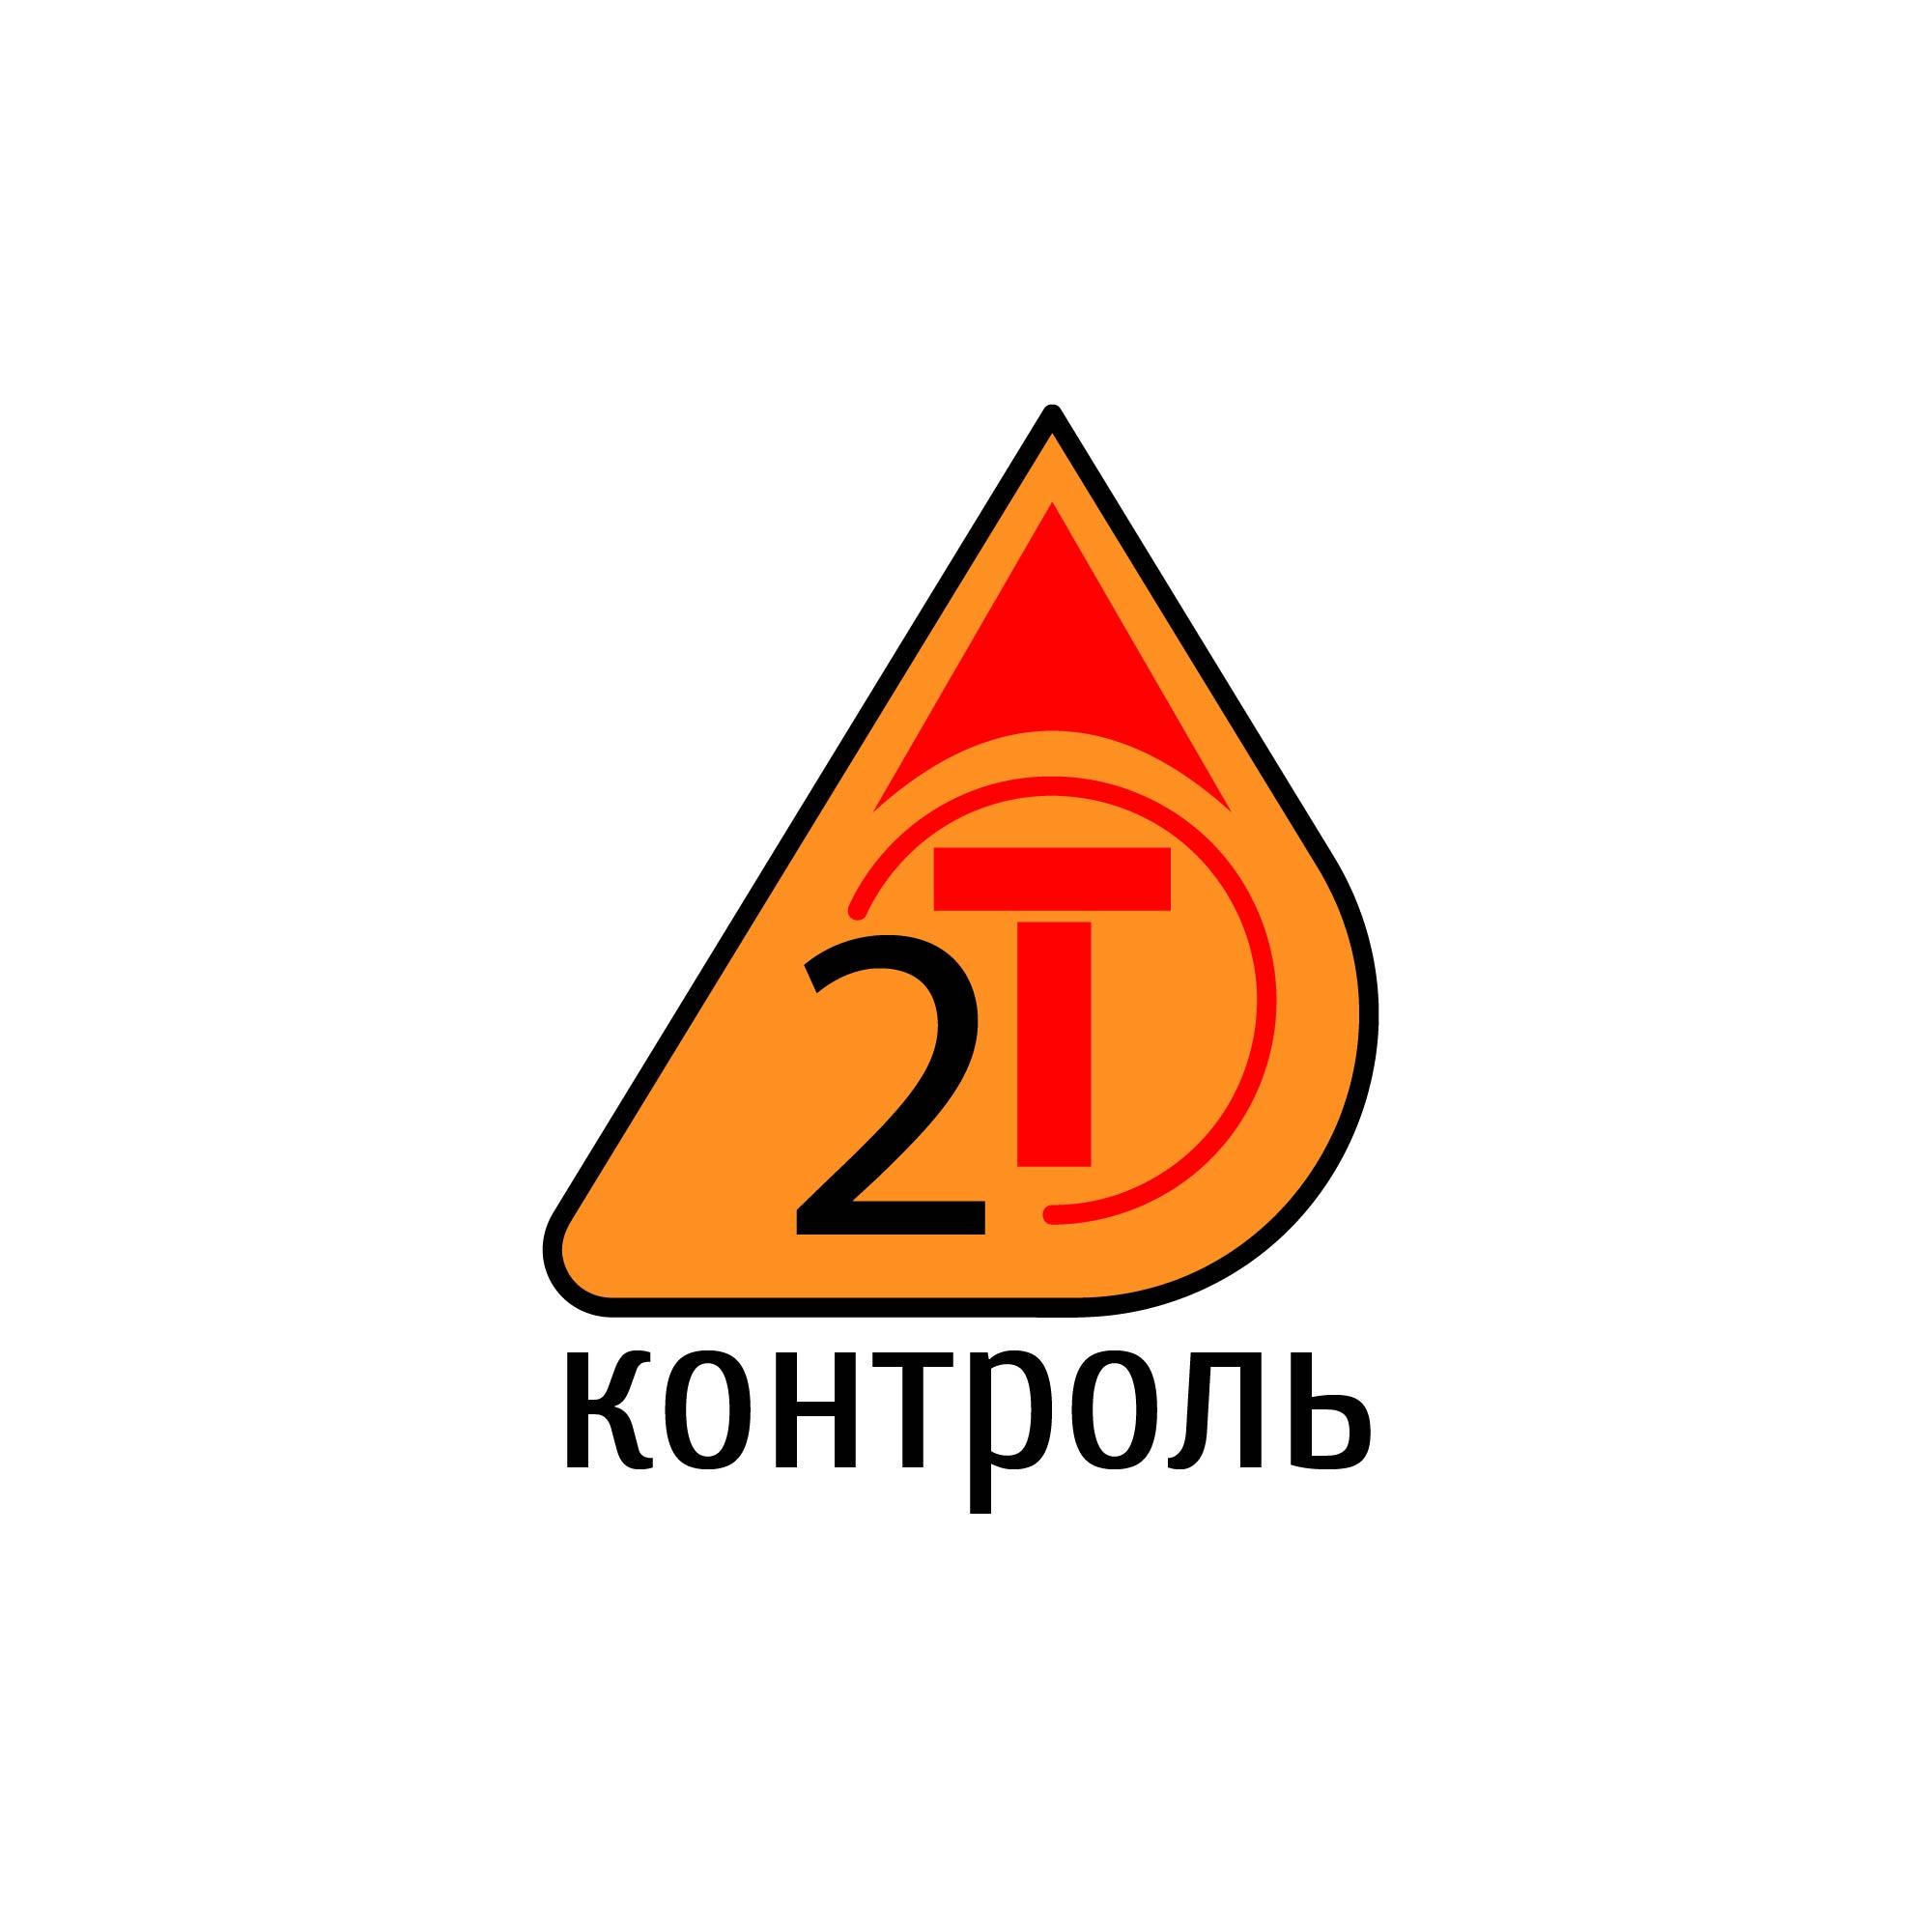 Разработать логотип фото f_6325e21ed6eb52dd.jpg